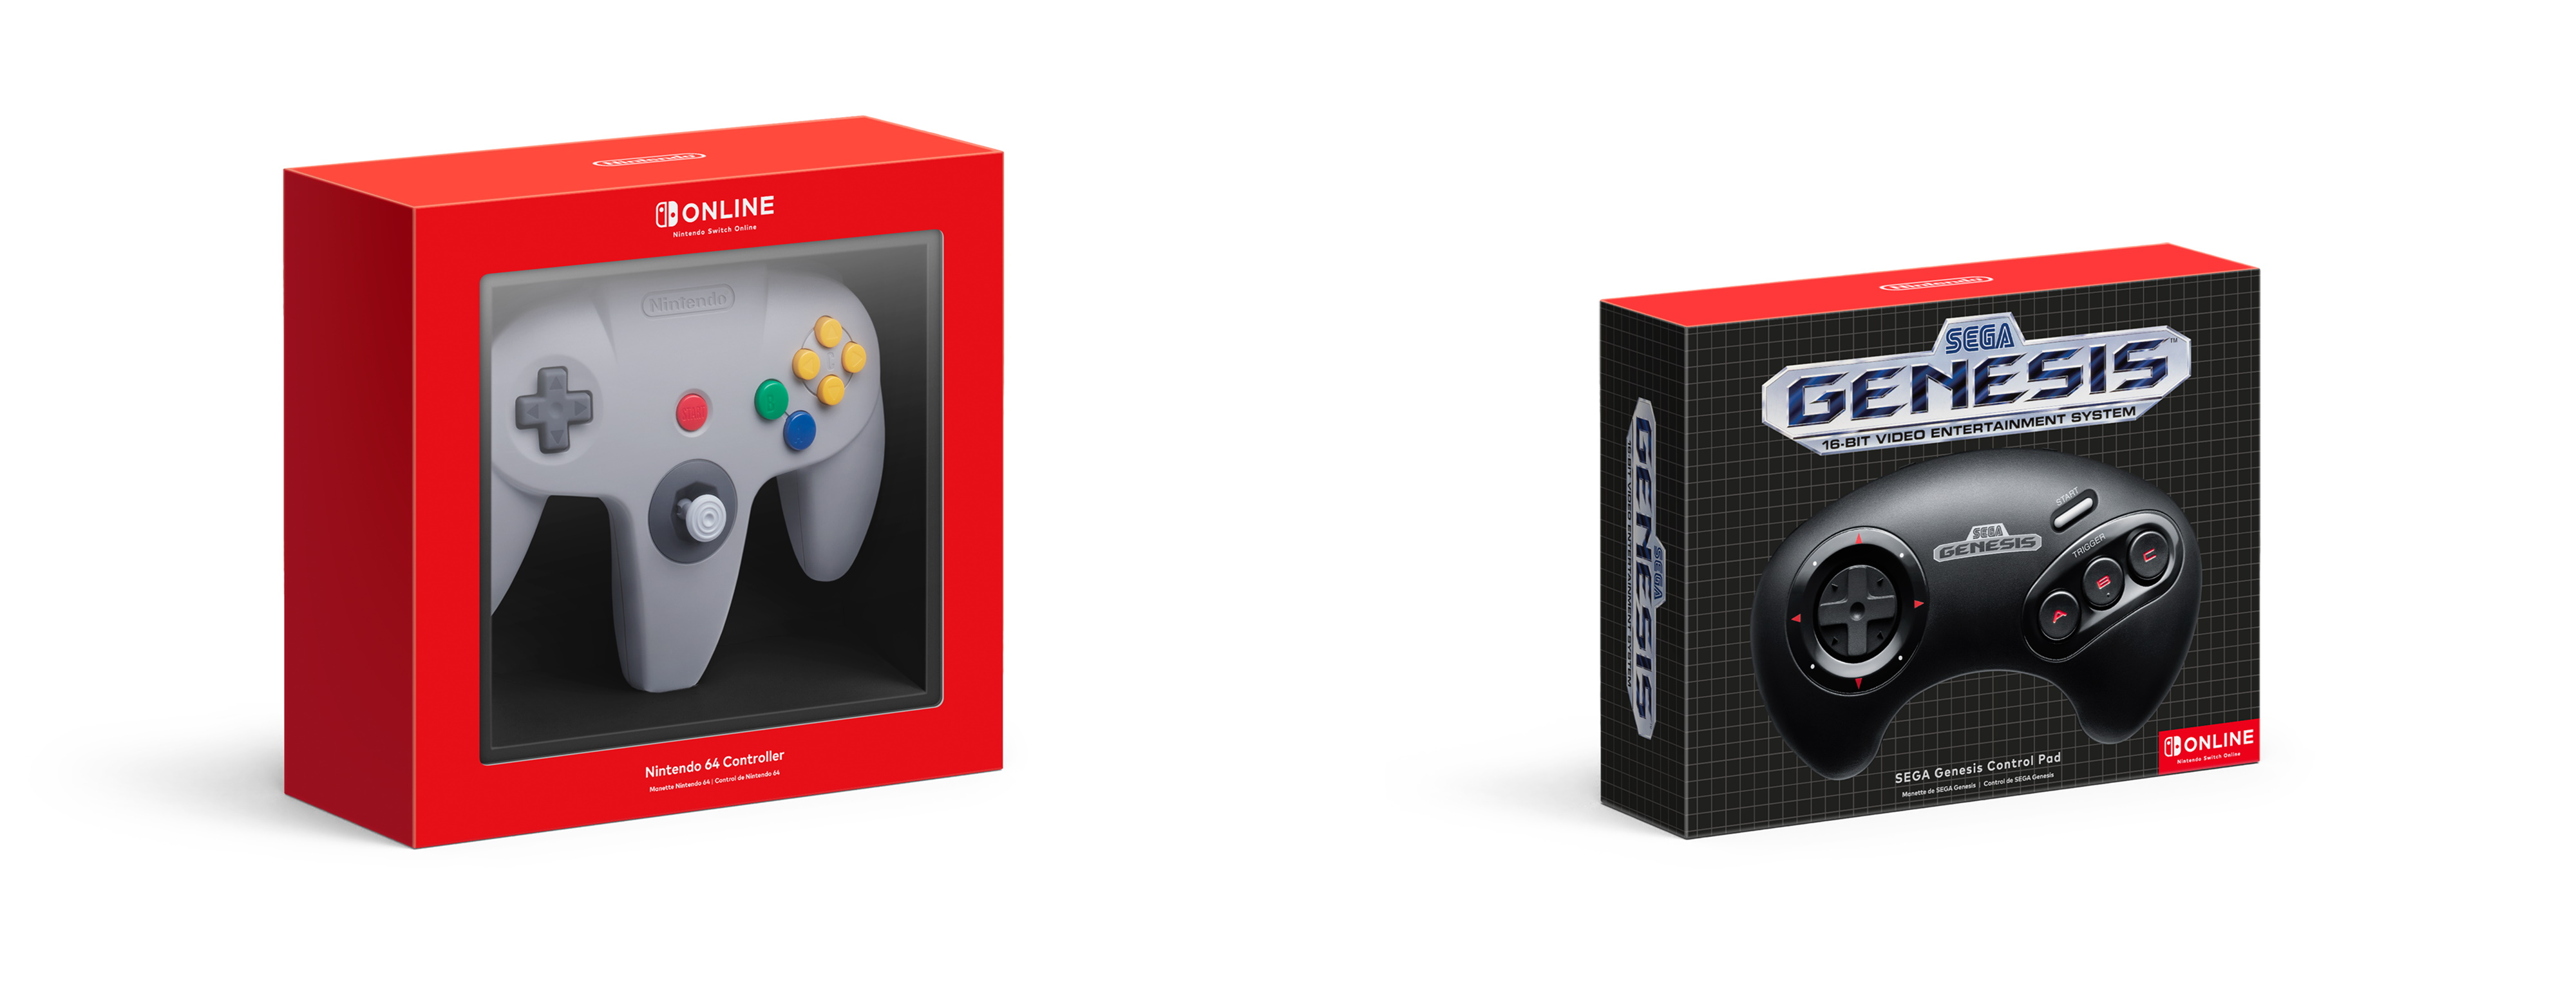 Nintendo Switch Online Nintendo 64 Sega Genesis Mega Drive ohjaimet